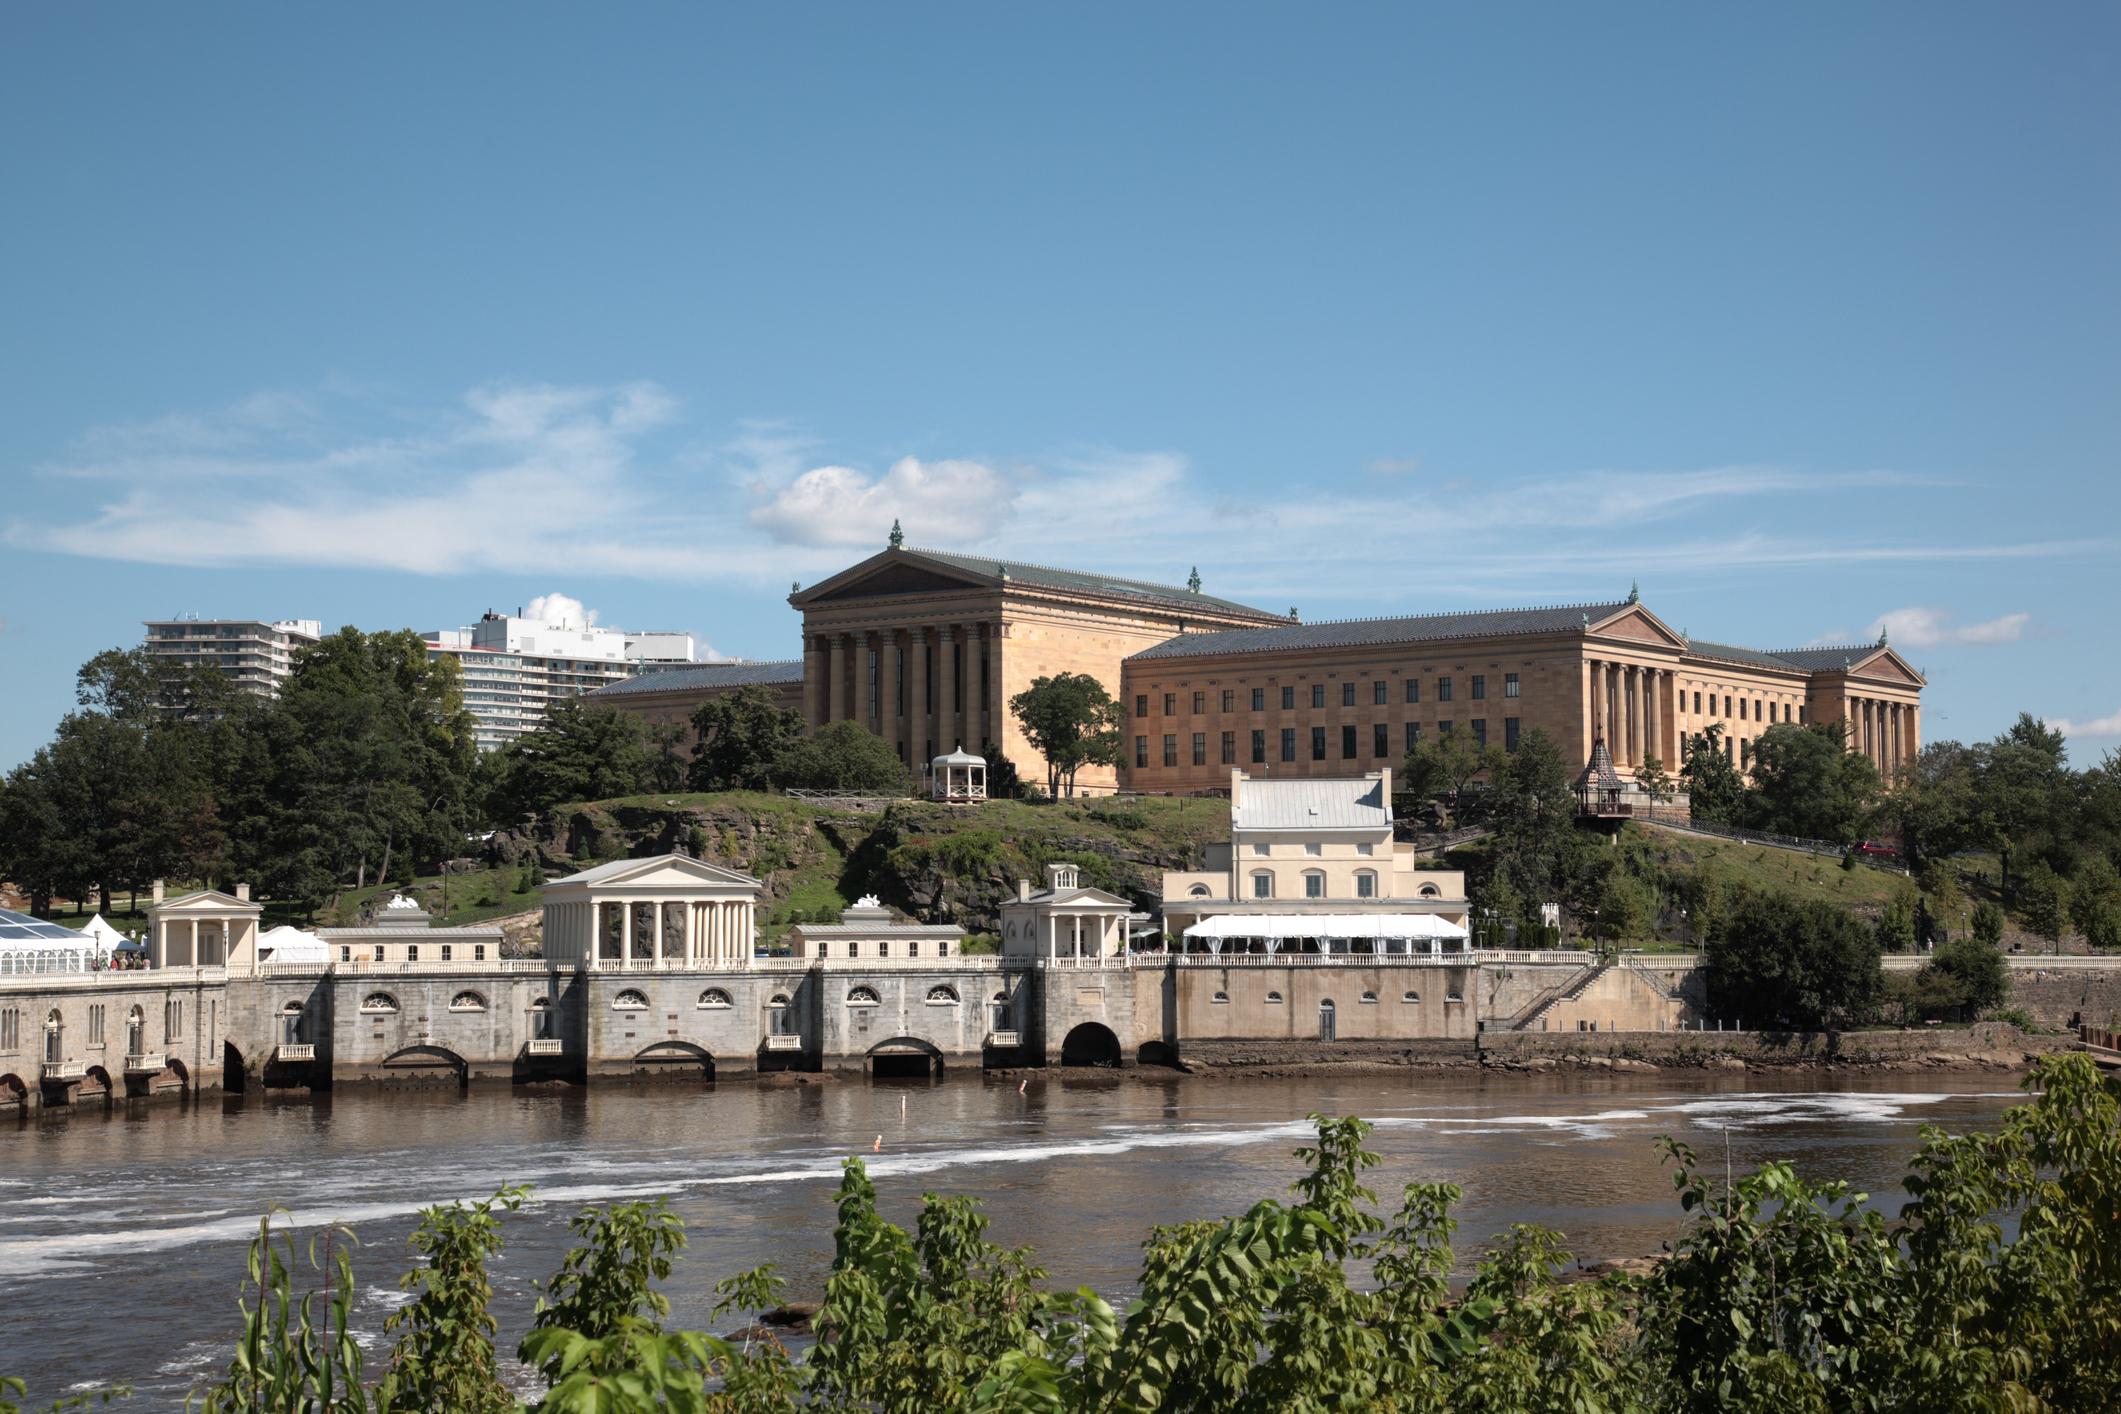 Philadelphia's Fairmount Water Works – America's Most Famous WaterSpace